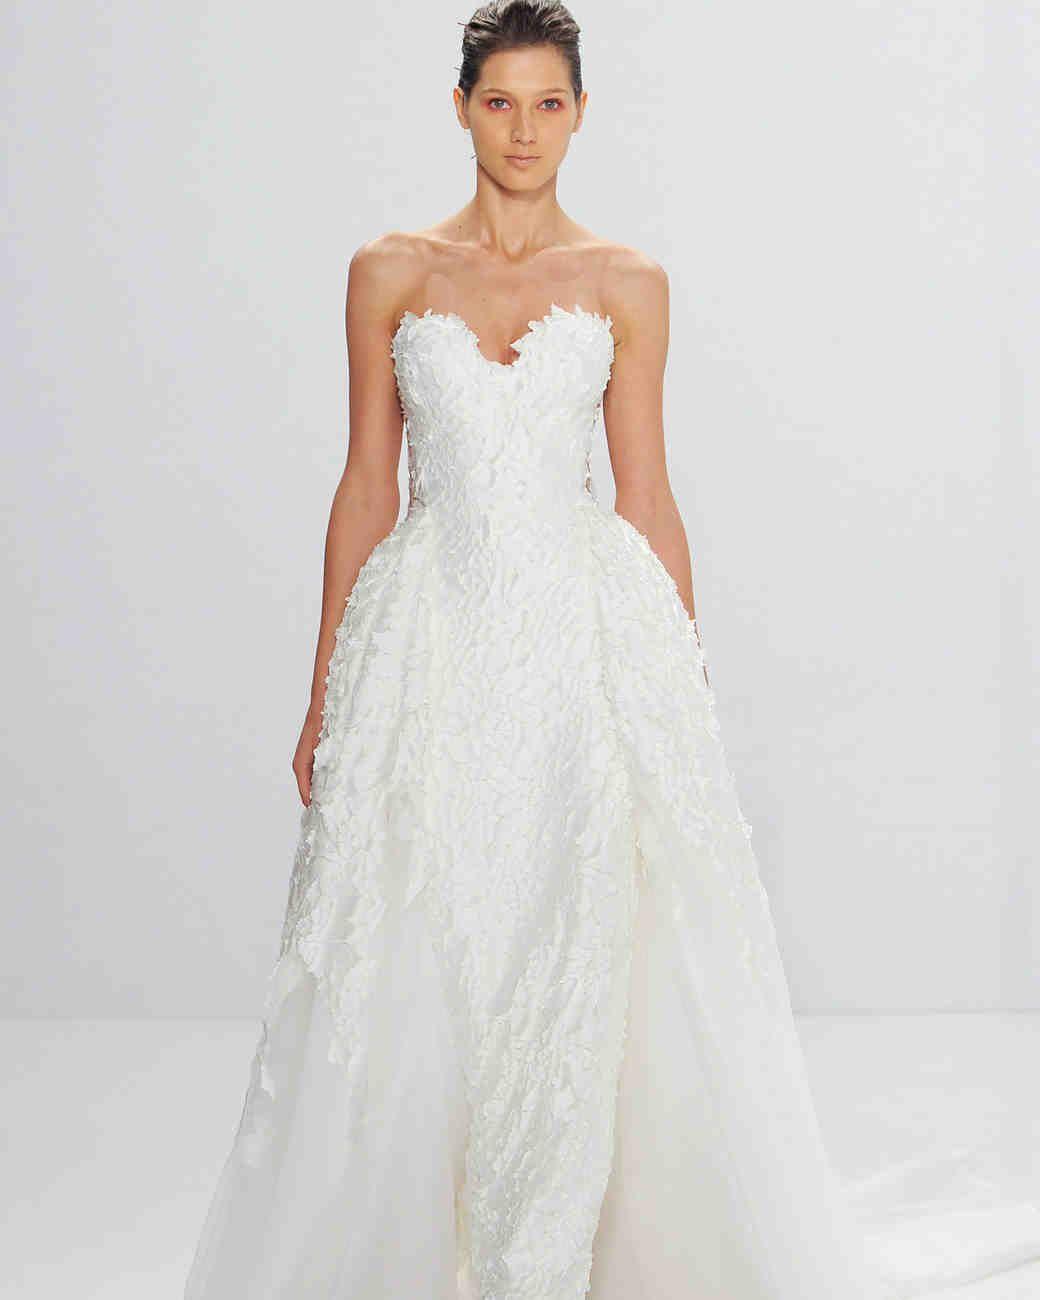 Lisa robertson in wedding dress - Bridal Fashion Week